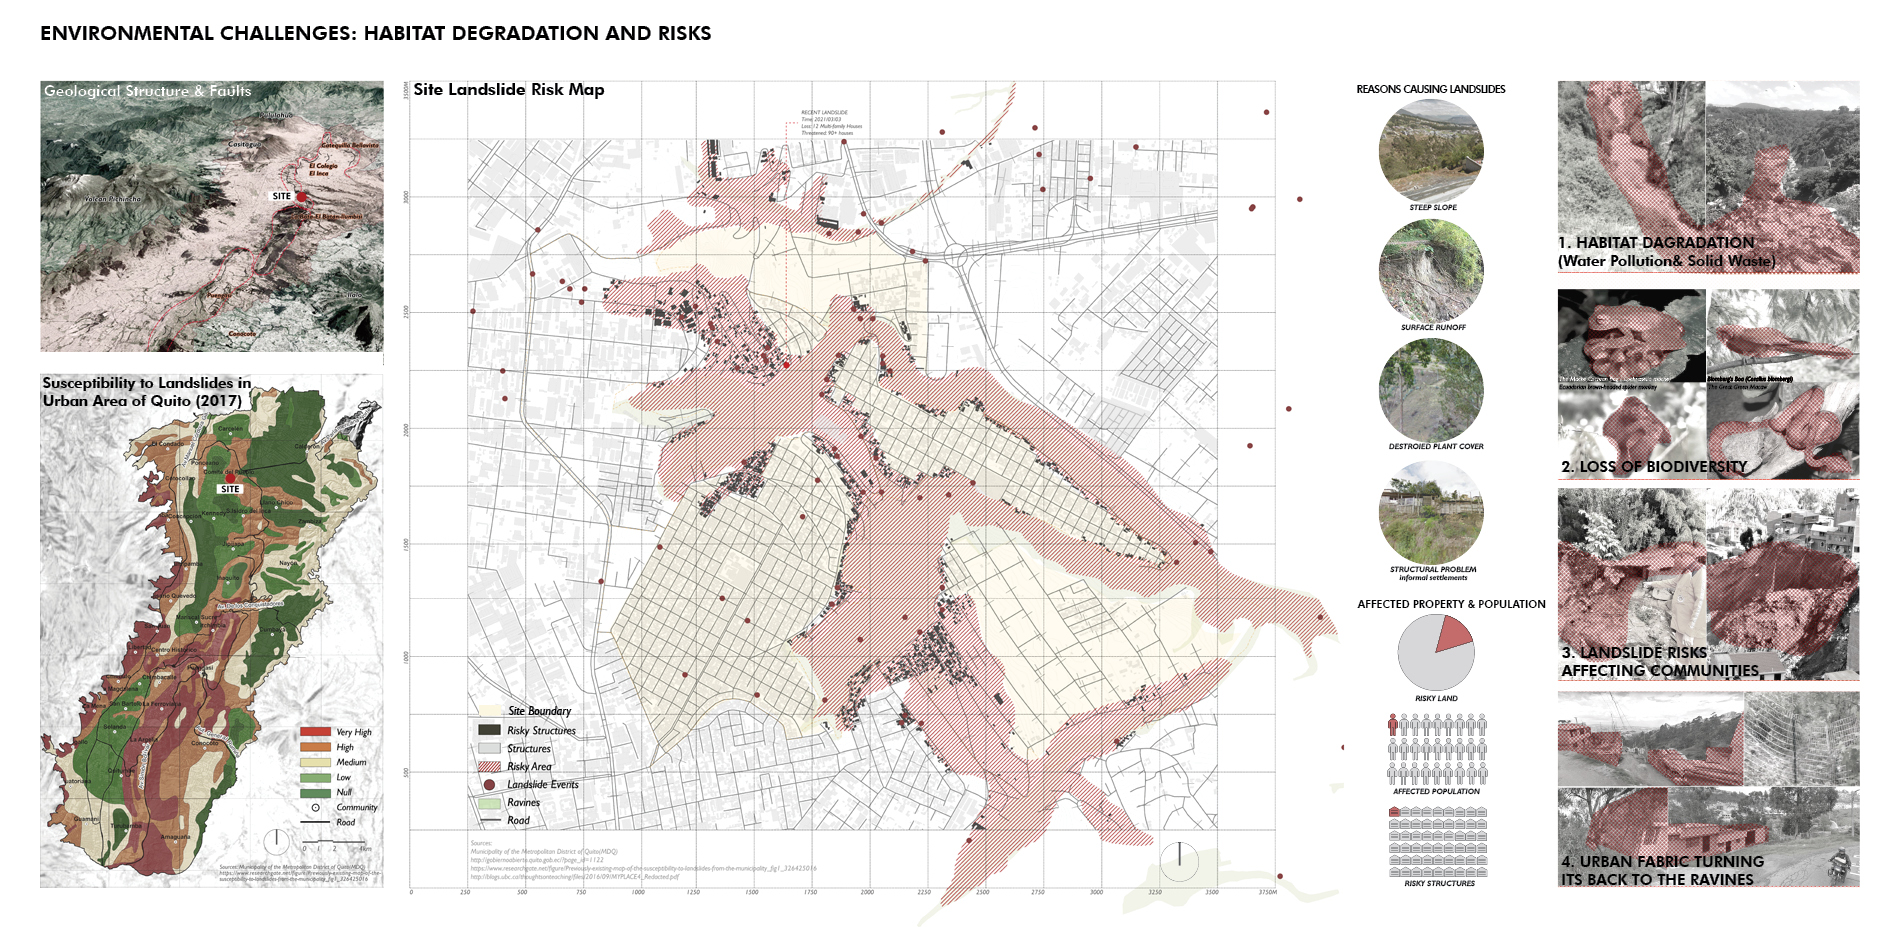 Environmental Challenges: Habitat Degradation and Risks